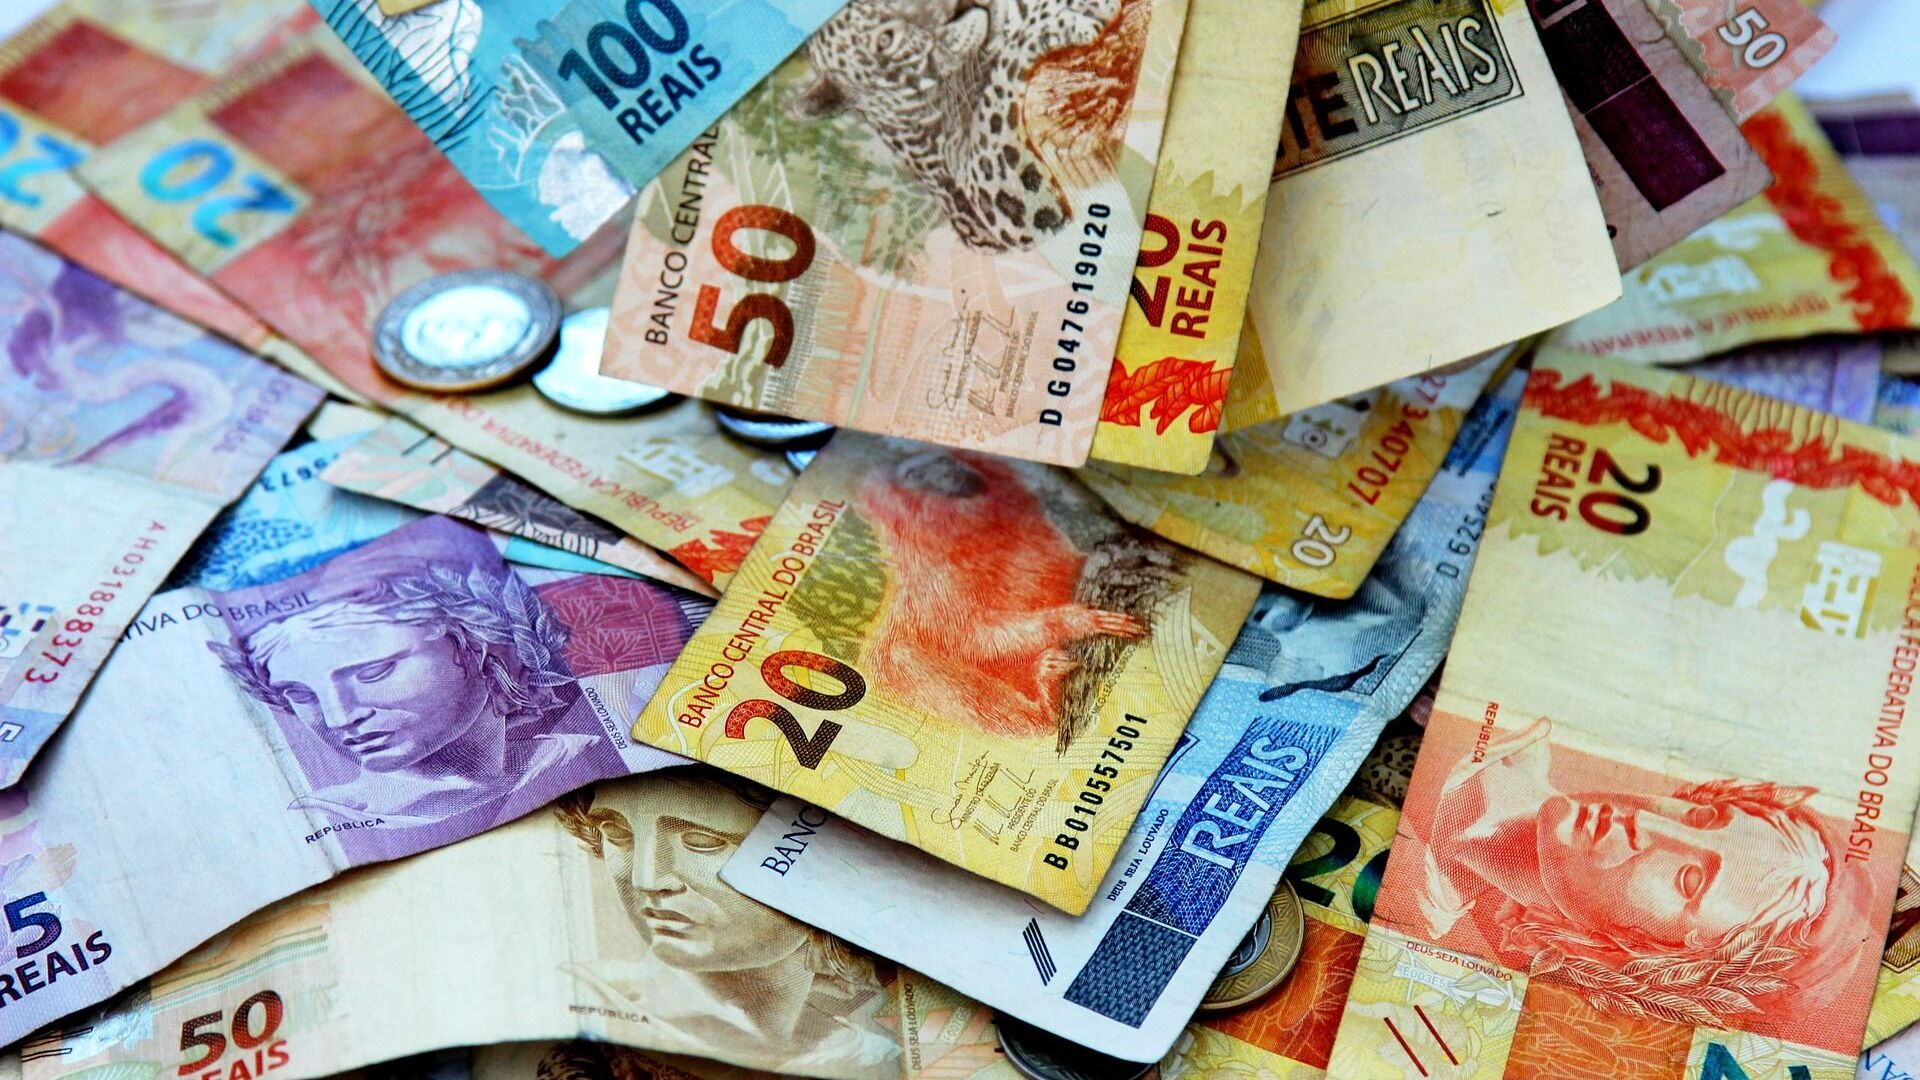 Billetes y monedas de real, la moneda brasileña - Sputnik Mundo, 1920, 05.02.2021